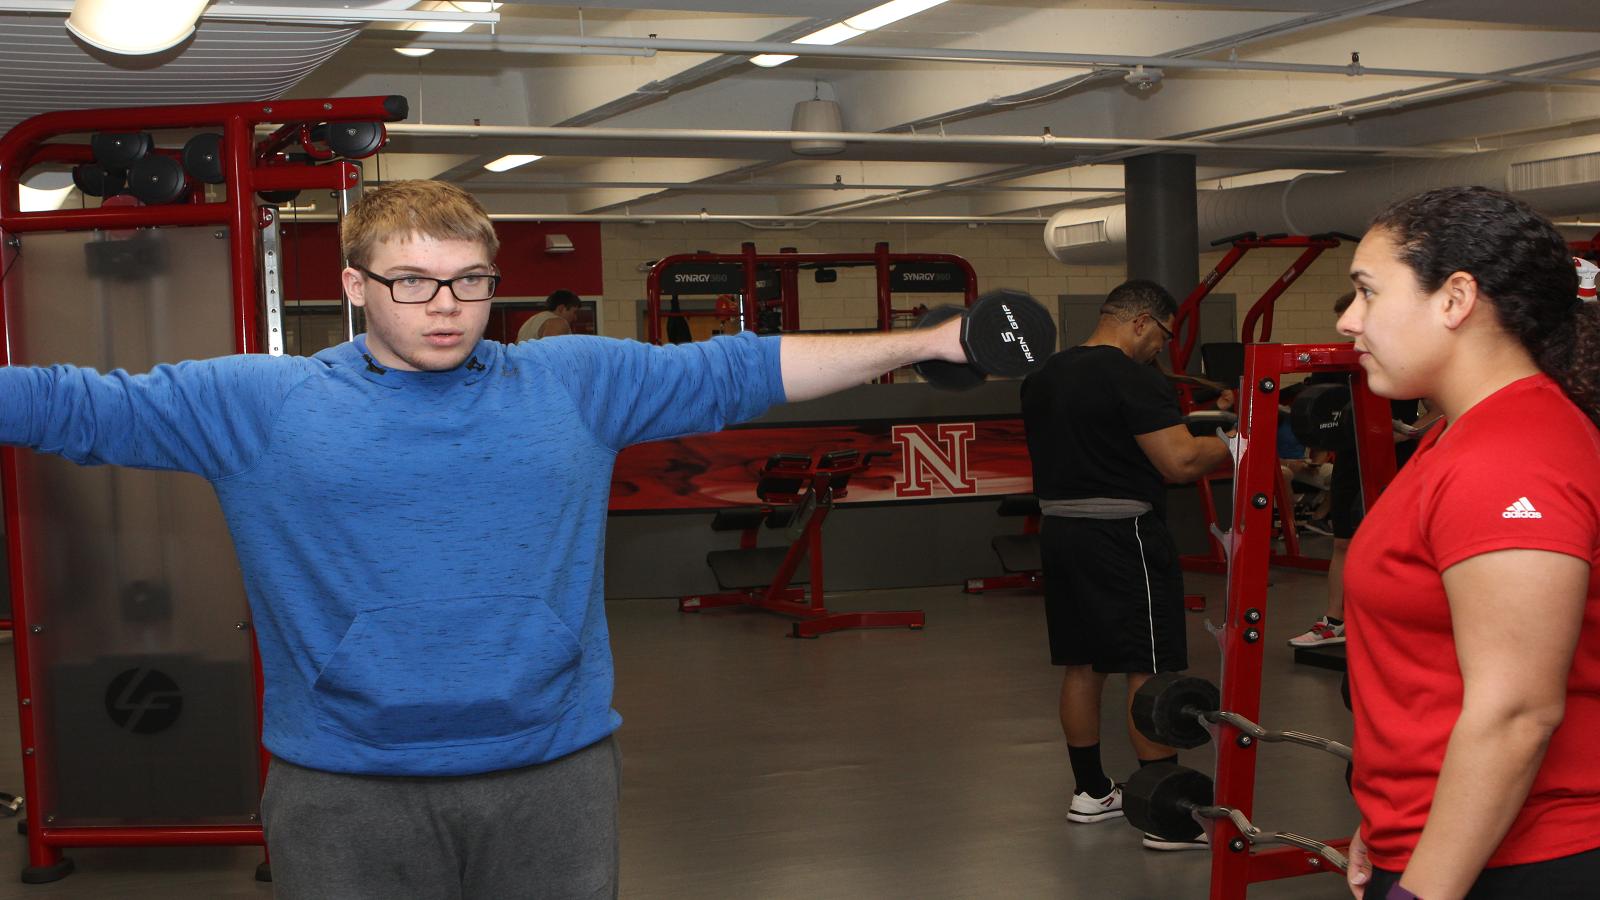 Personal Training Wellness Assessments Campus Recreation Nebraska - Unl training table